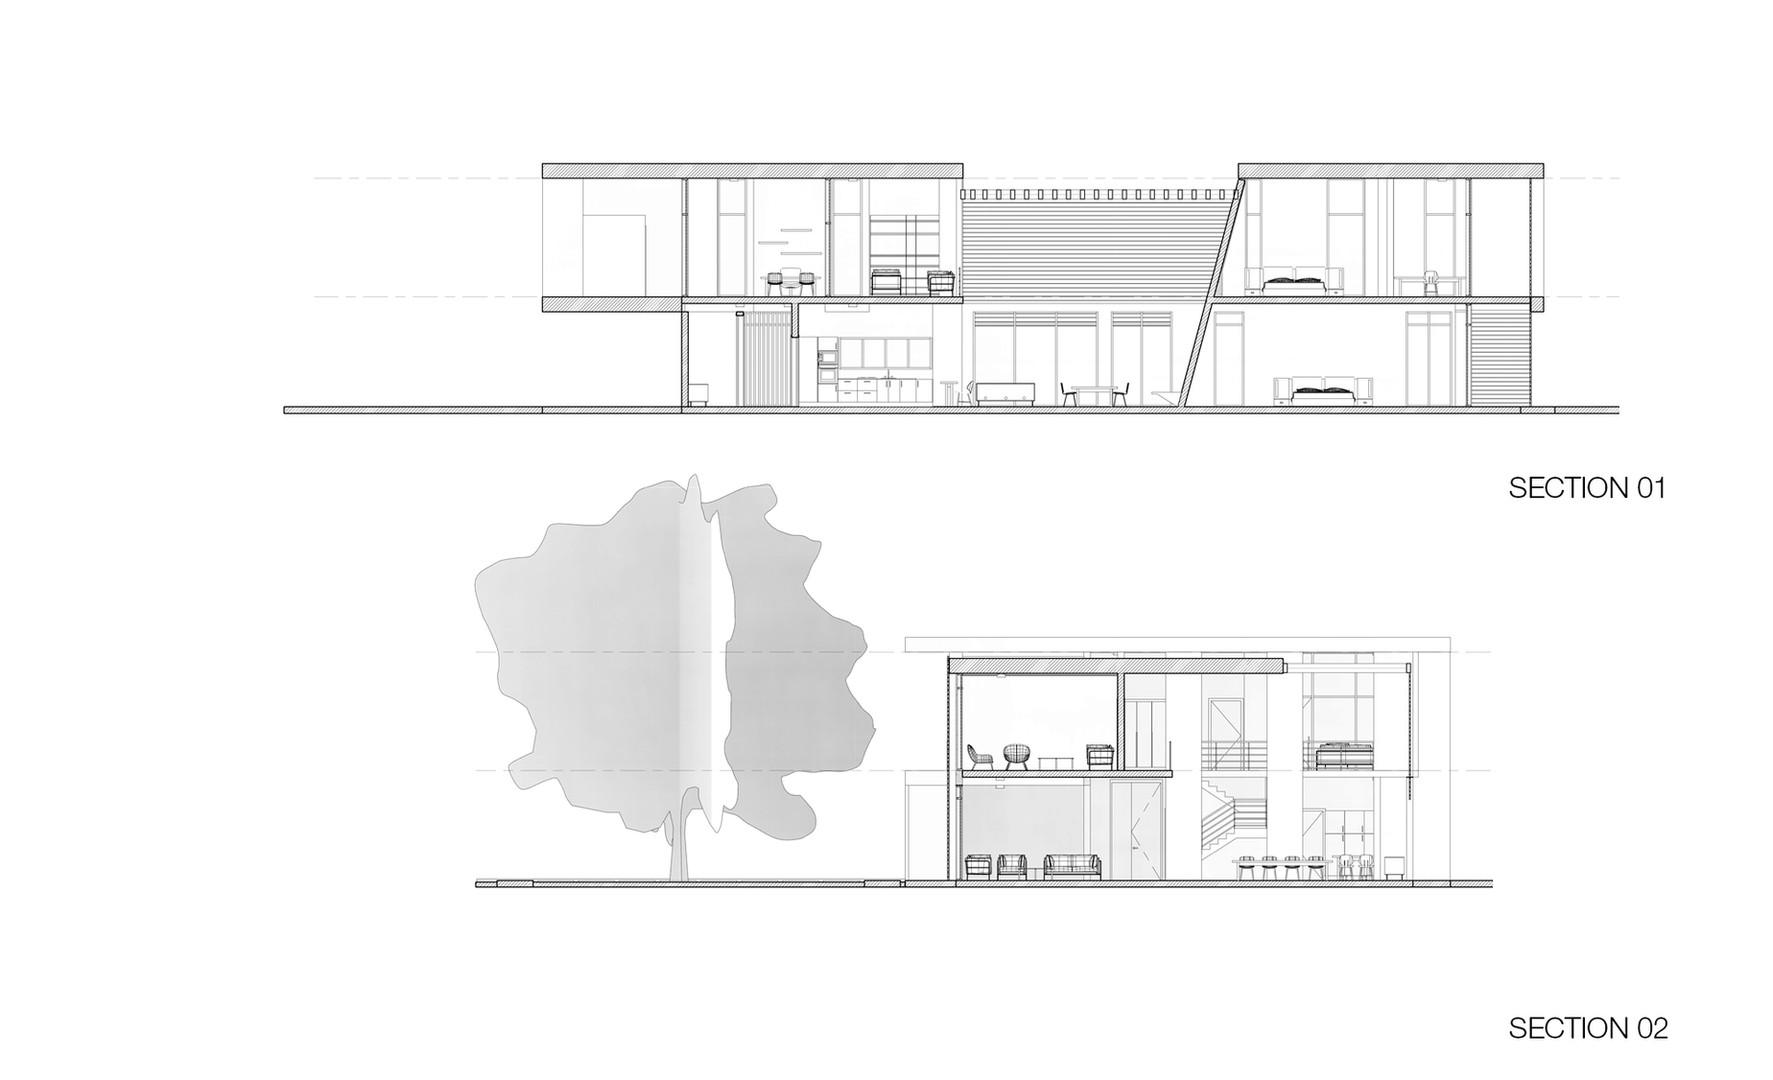 Sections_01_Leda_Picasso Homes.jpg